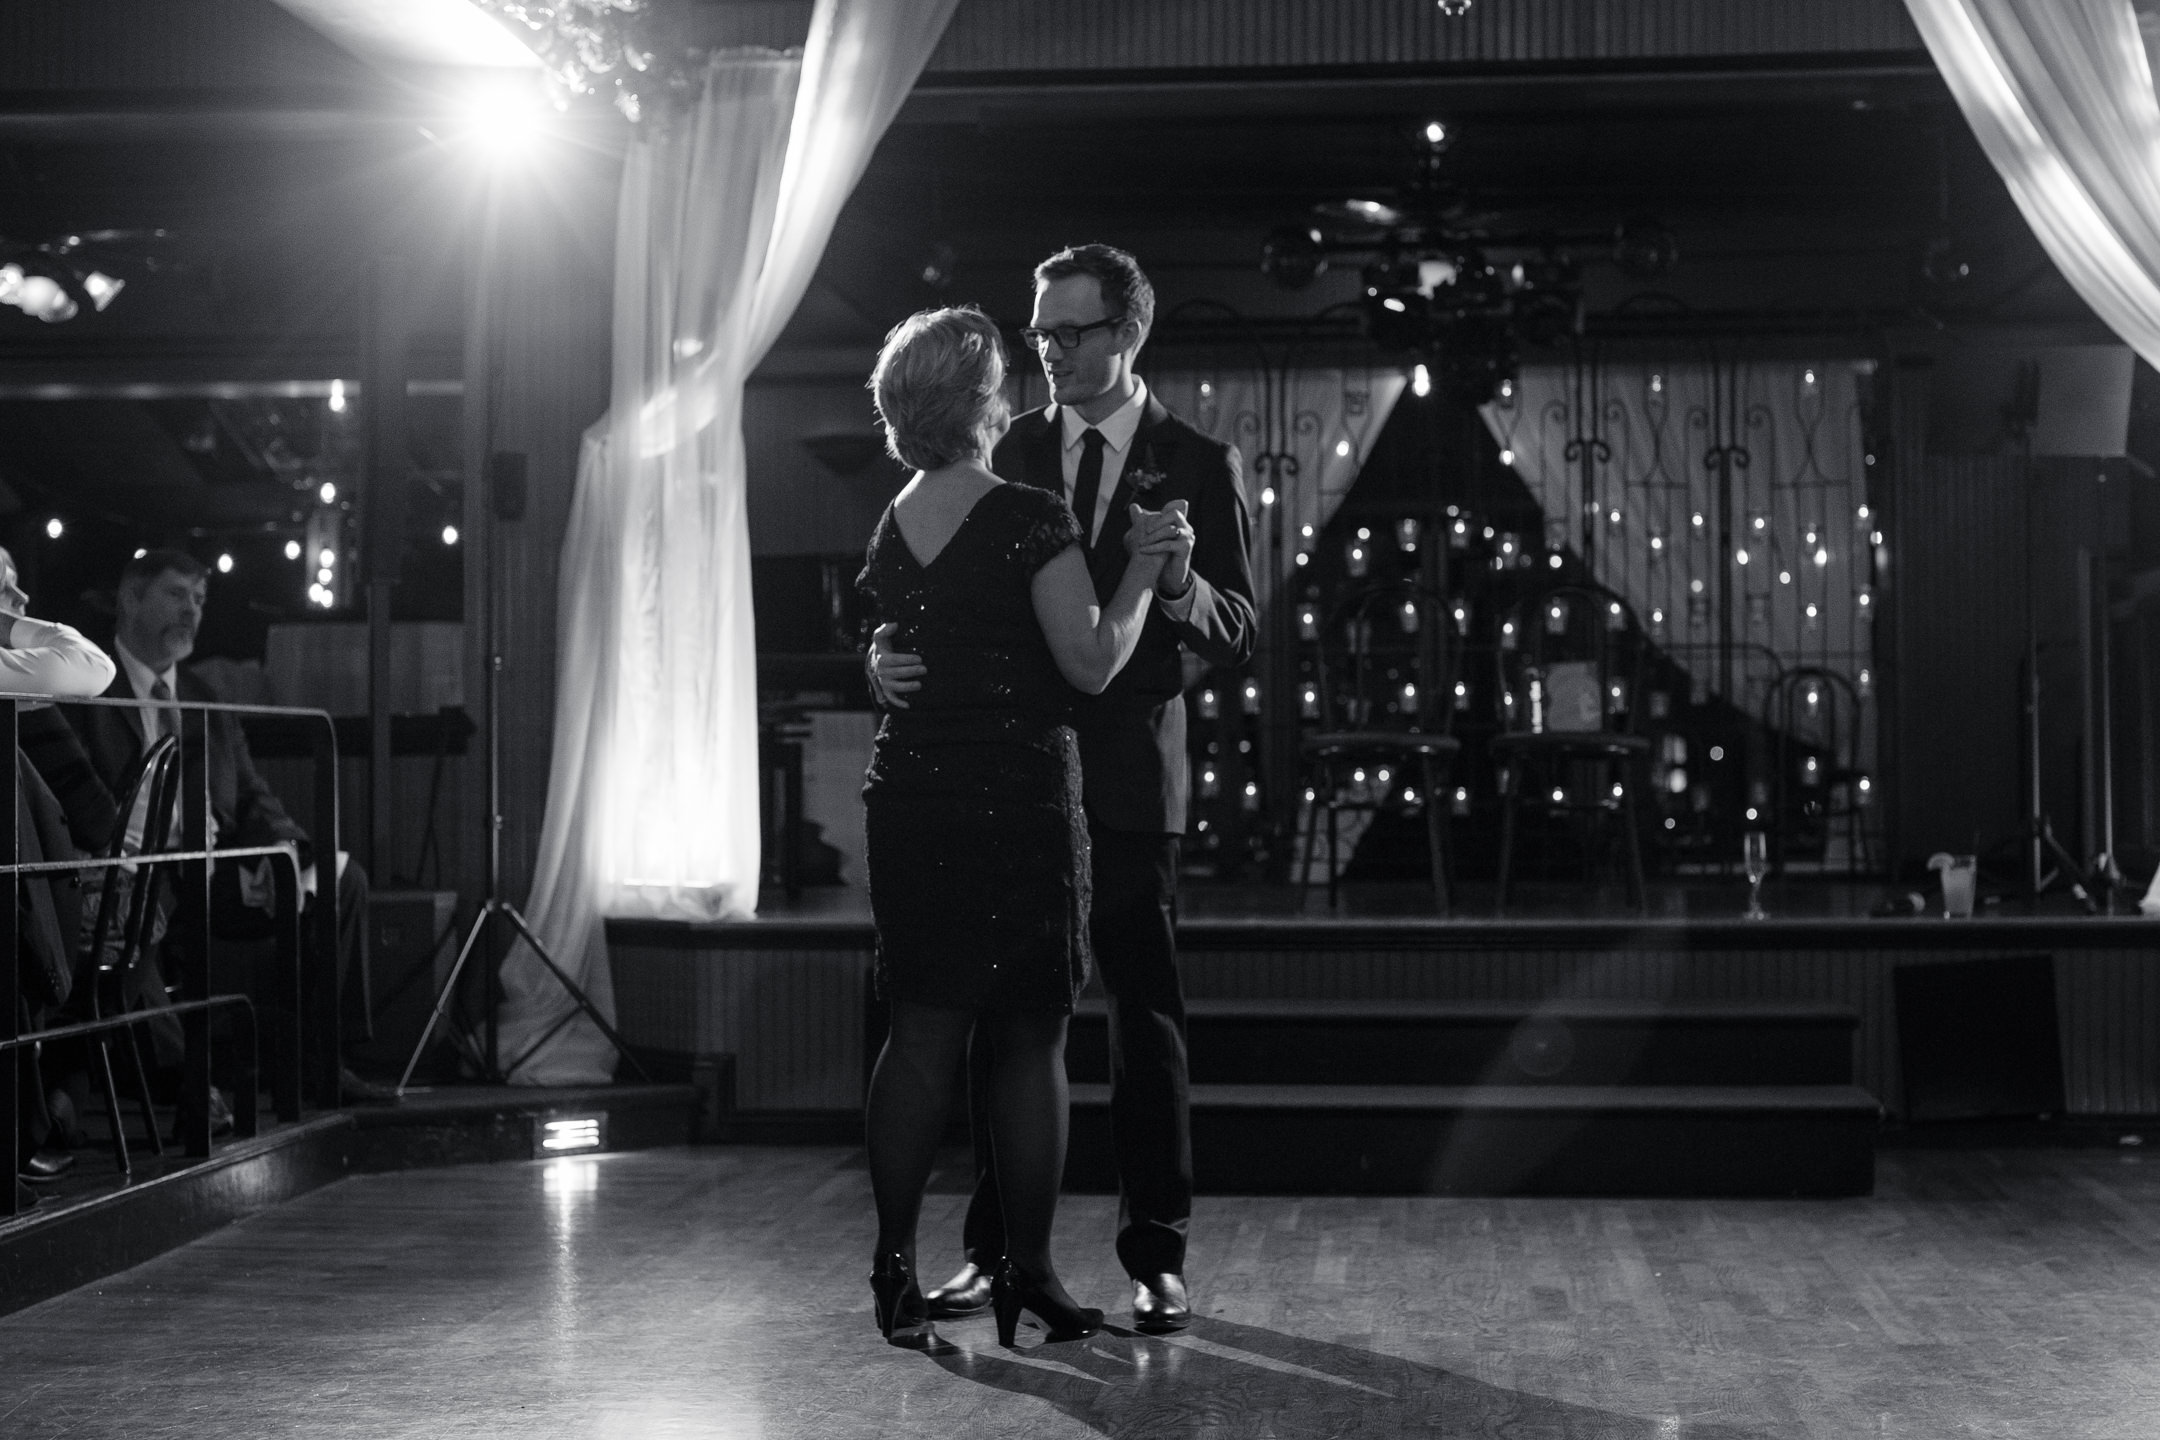 Documentary-Wedding-Photography-Andrew-Tat-Gabi & Kim-29.jpg